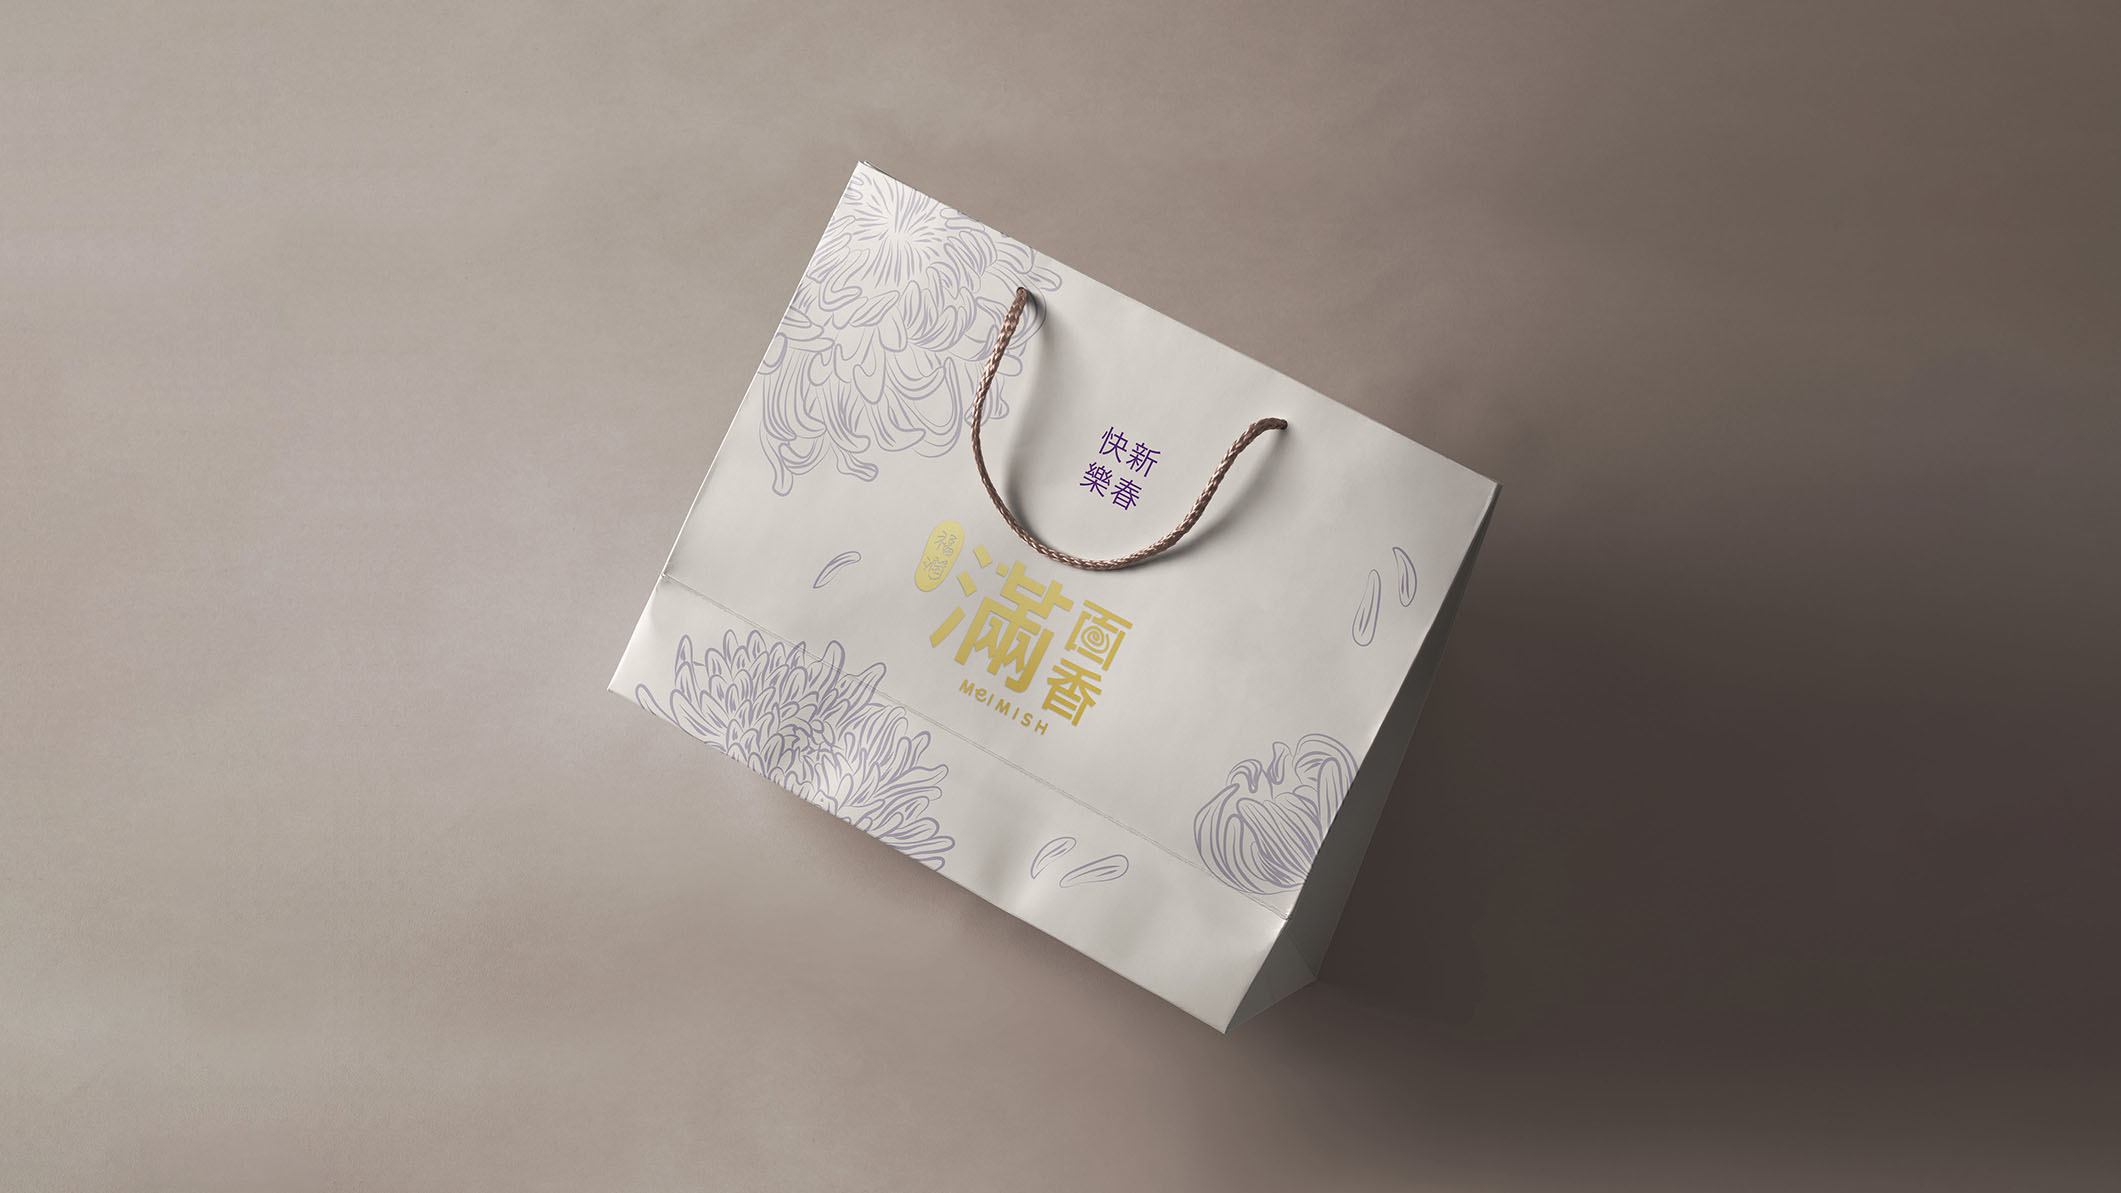 Meimish_Chinese New Year_Packaging_Bag_Gift_Branding.jpg